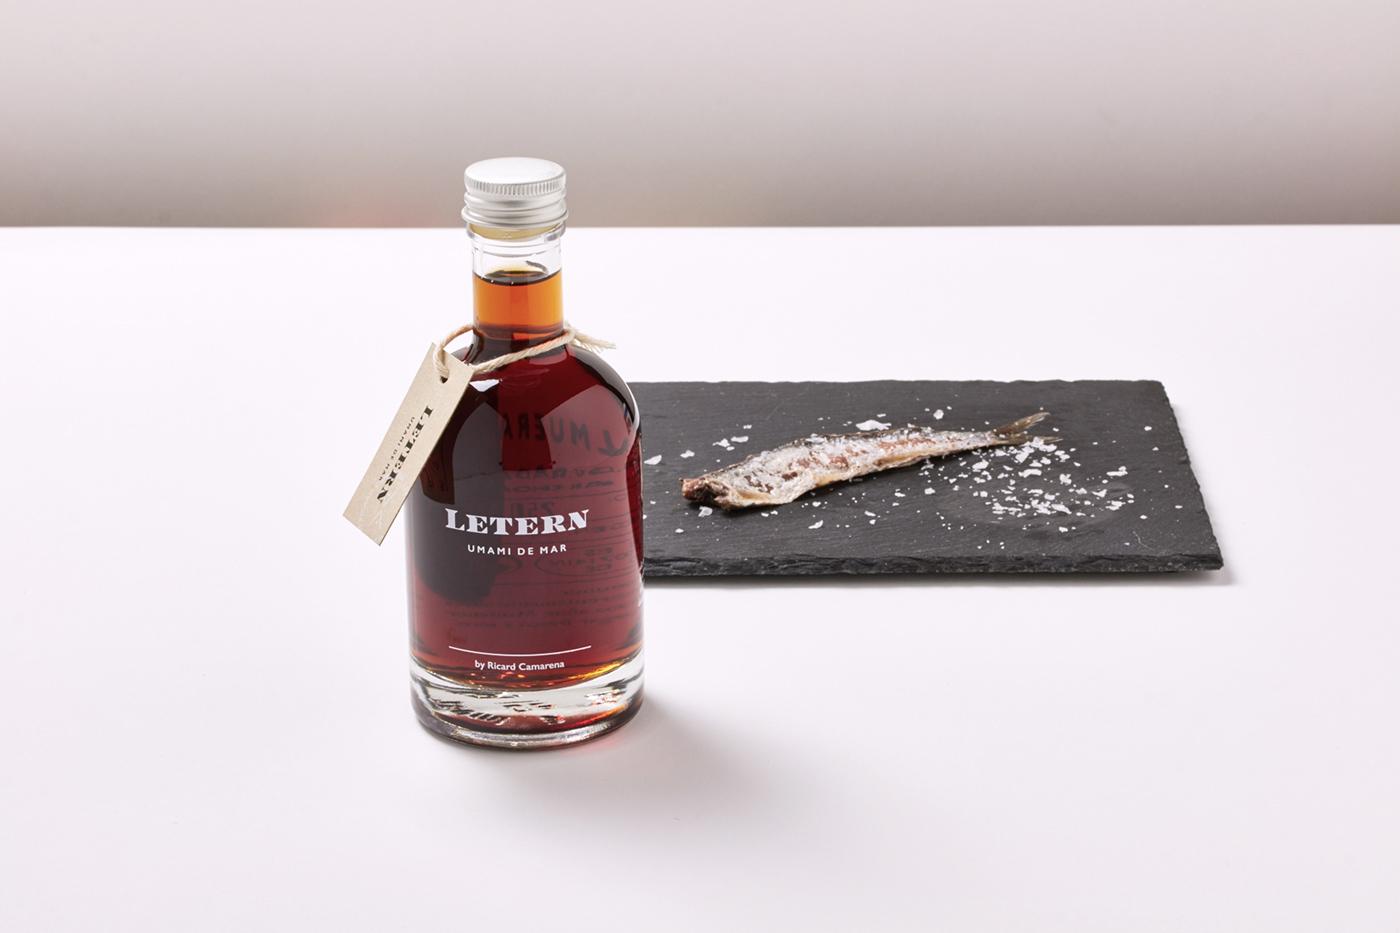 Letern anchovy sauce colatura anchoas  umami camarena lettering Packaging brandsummit